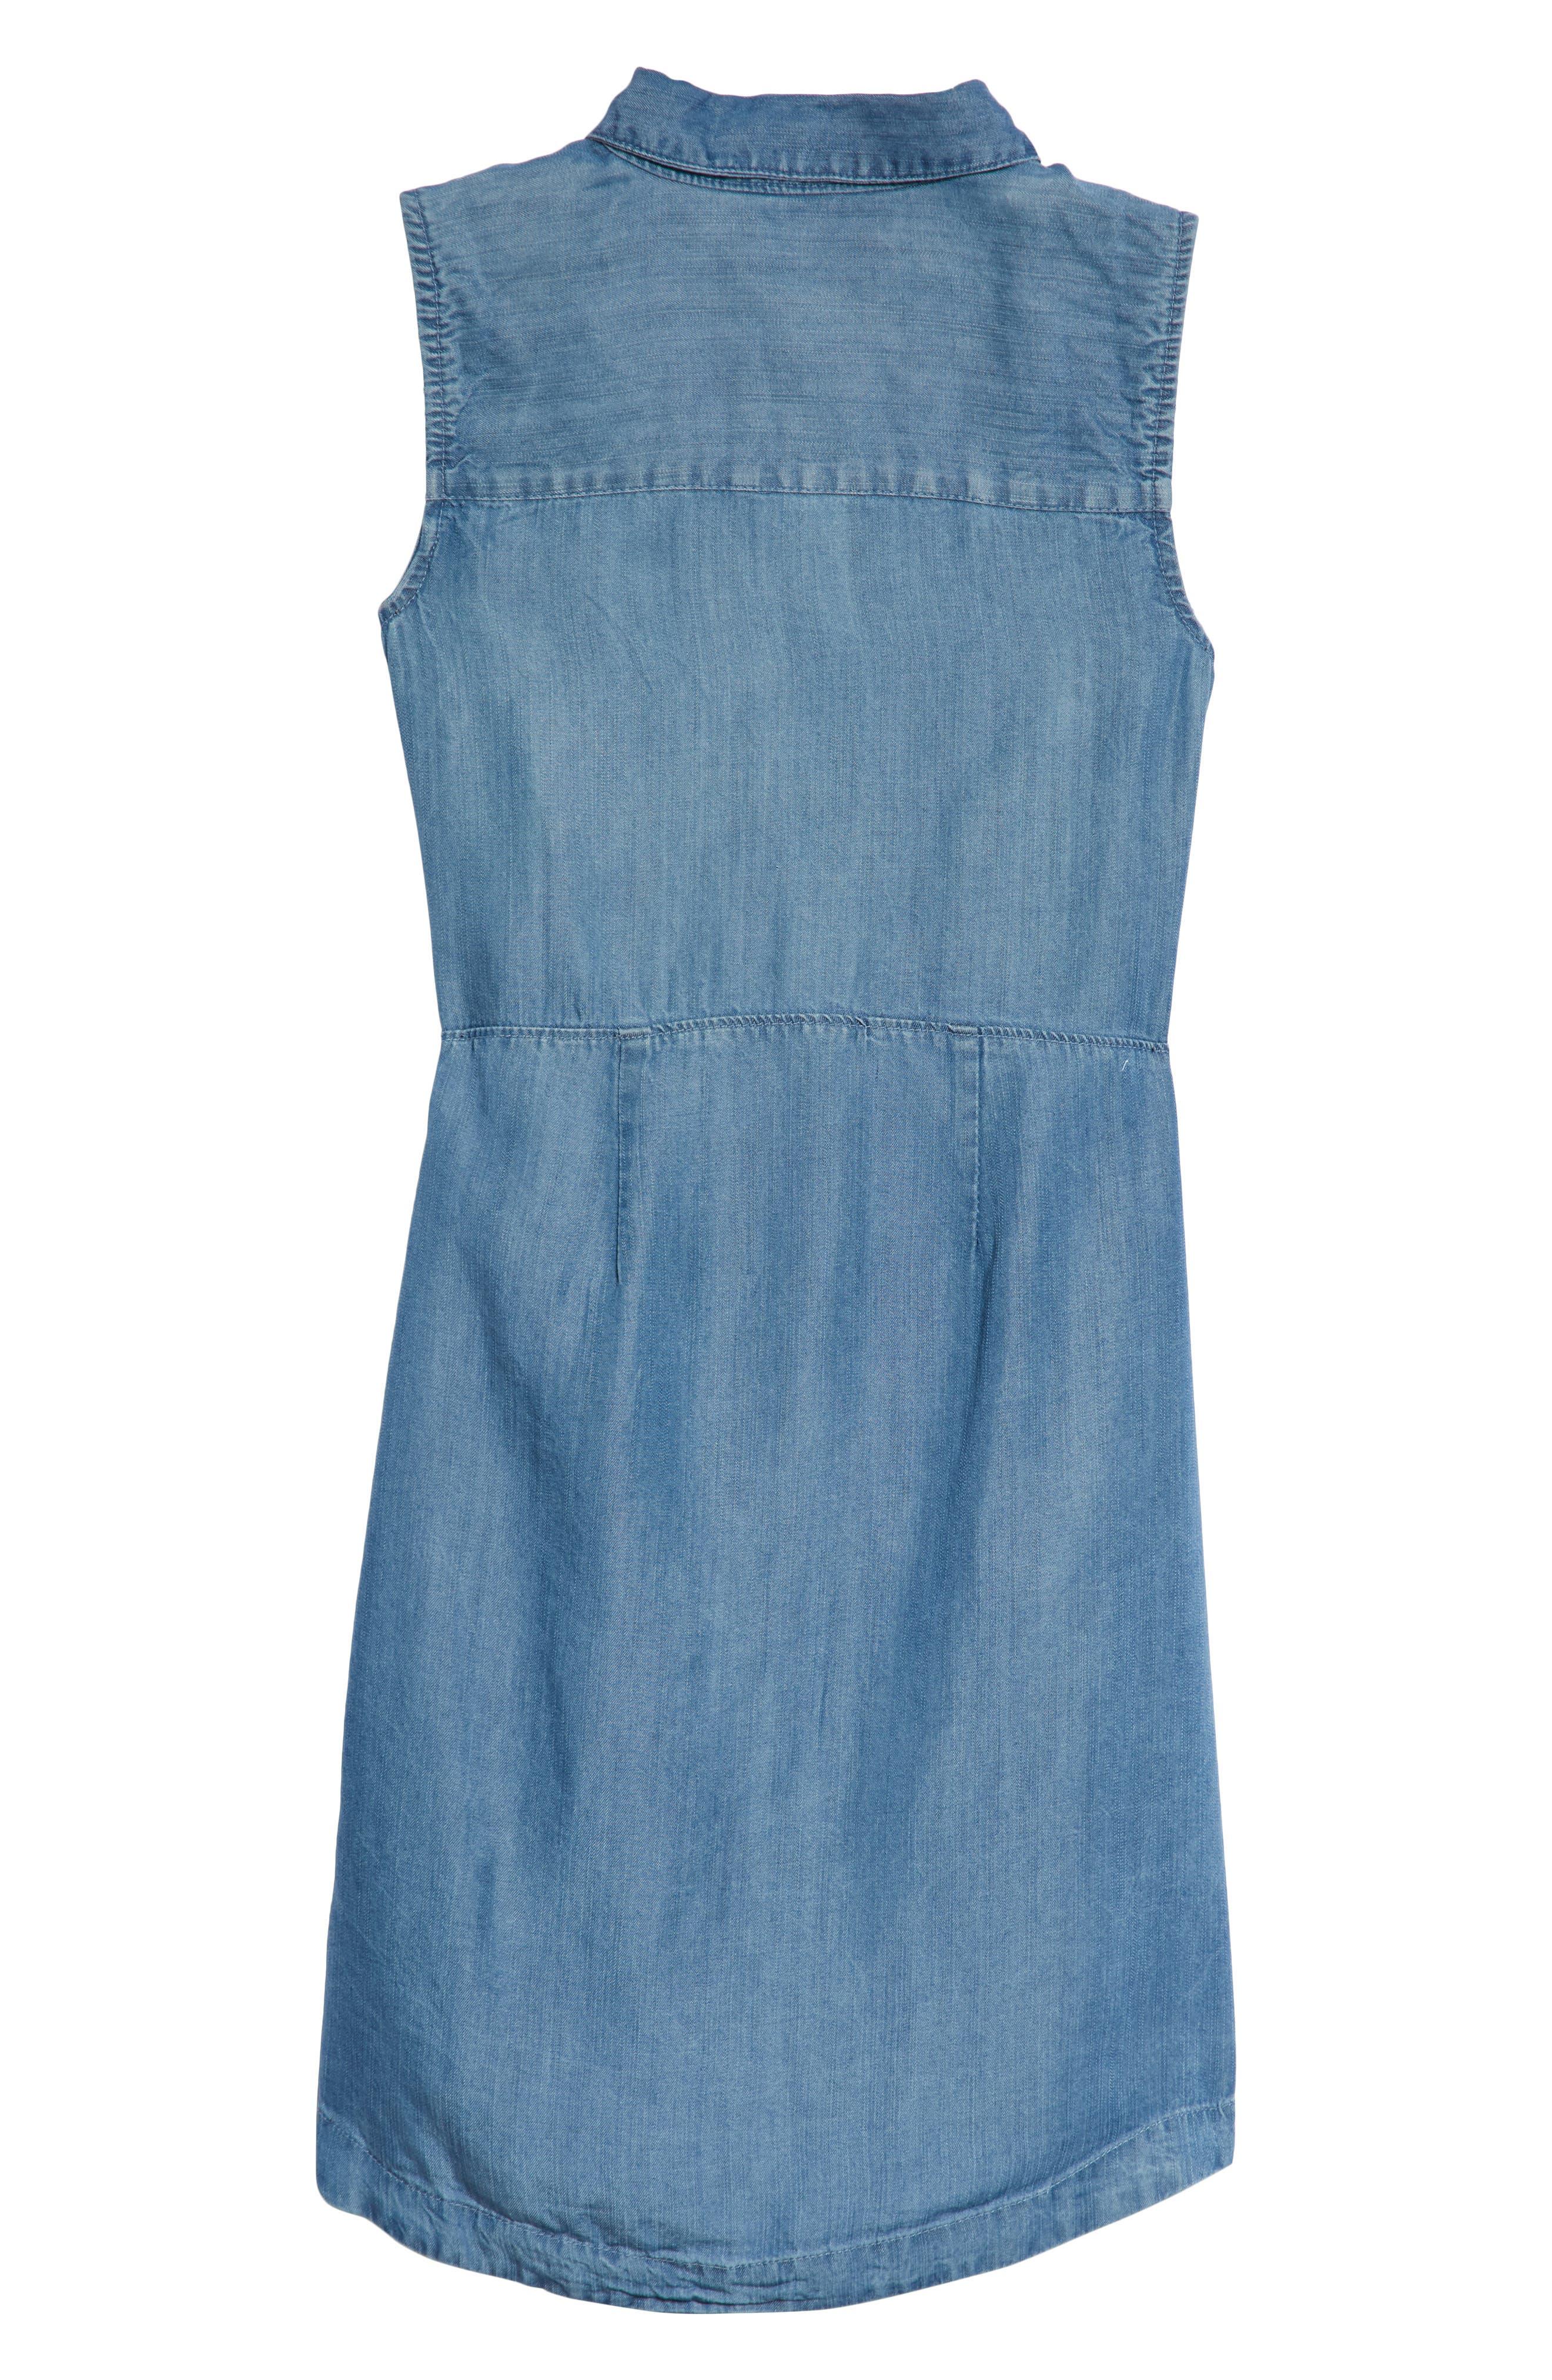 Denim Shirtdress,                             Alternate thumbnail 2, color,                             Bella Blue